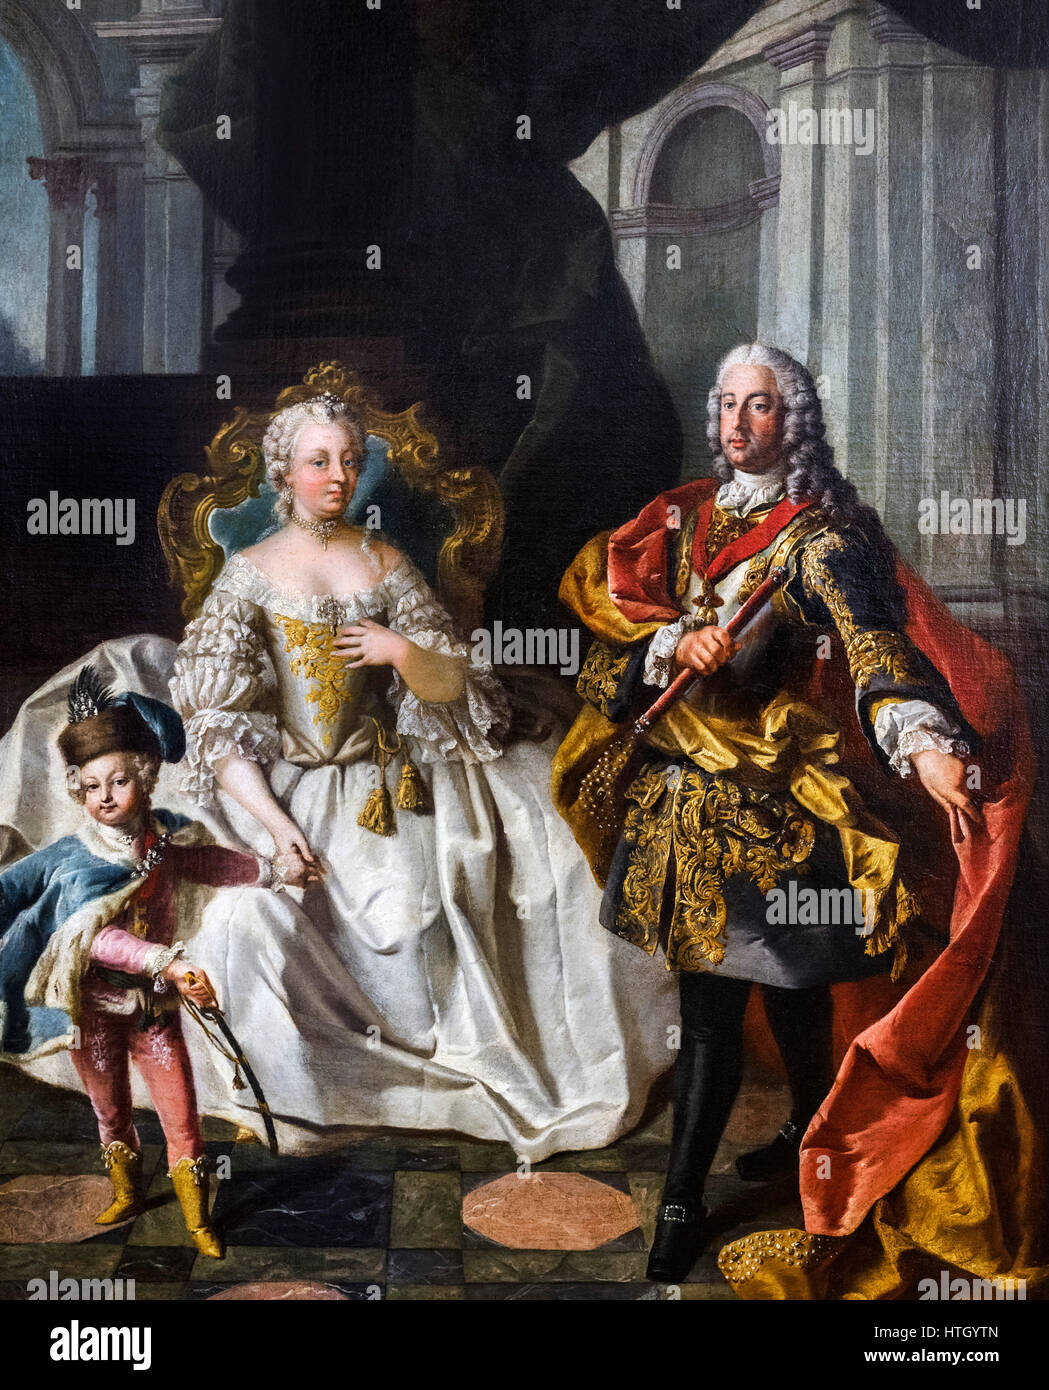 The Empress Maria Theresa (Maria Theresa Walburga Amalia Christina - 1717-1780) with her husband, Franz Stephan, - Stock Image